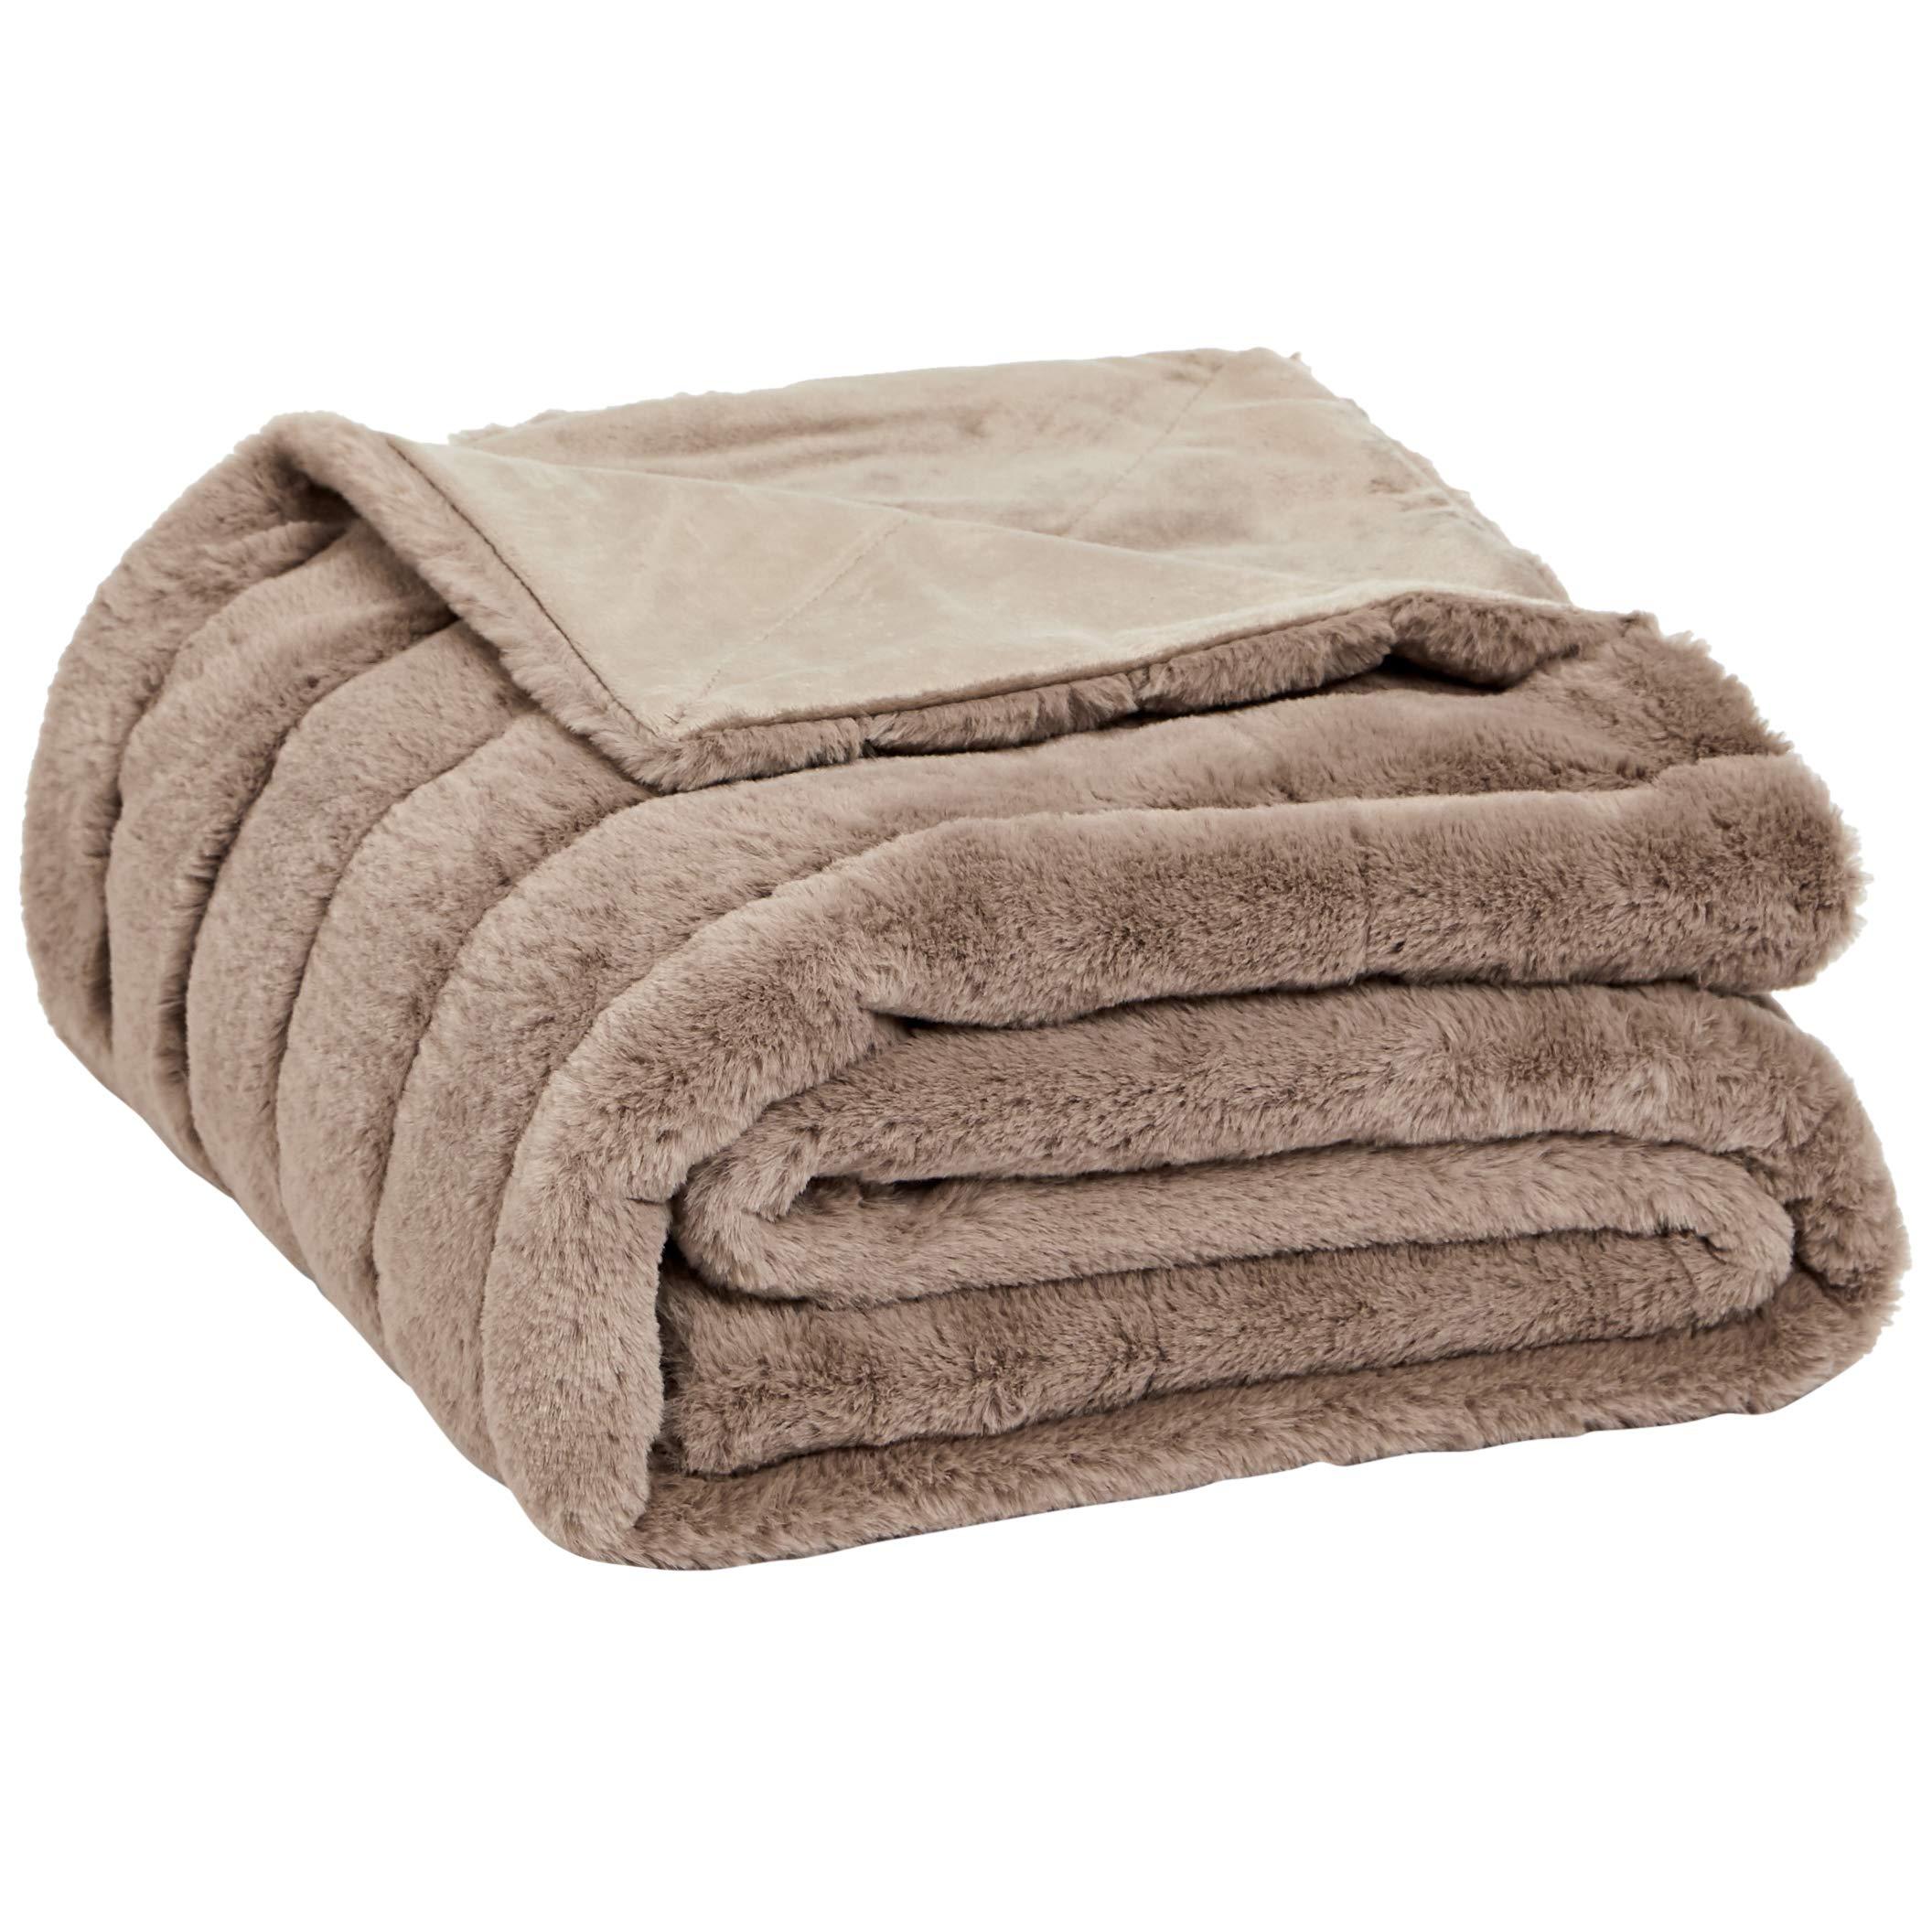 AmazonBasics Faux Fur Striped Throw Blanket - 63 x 87 Inch, Camel